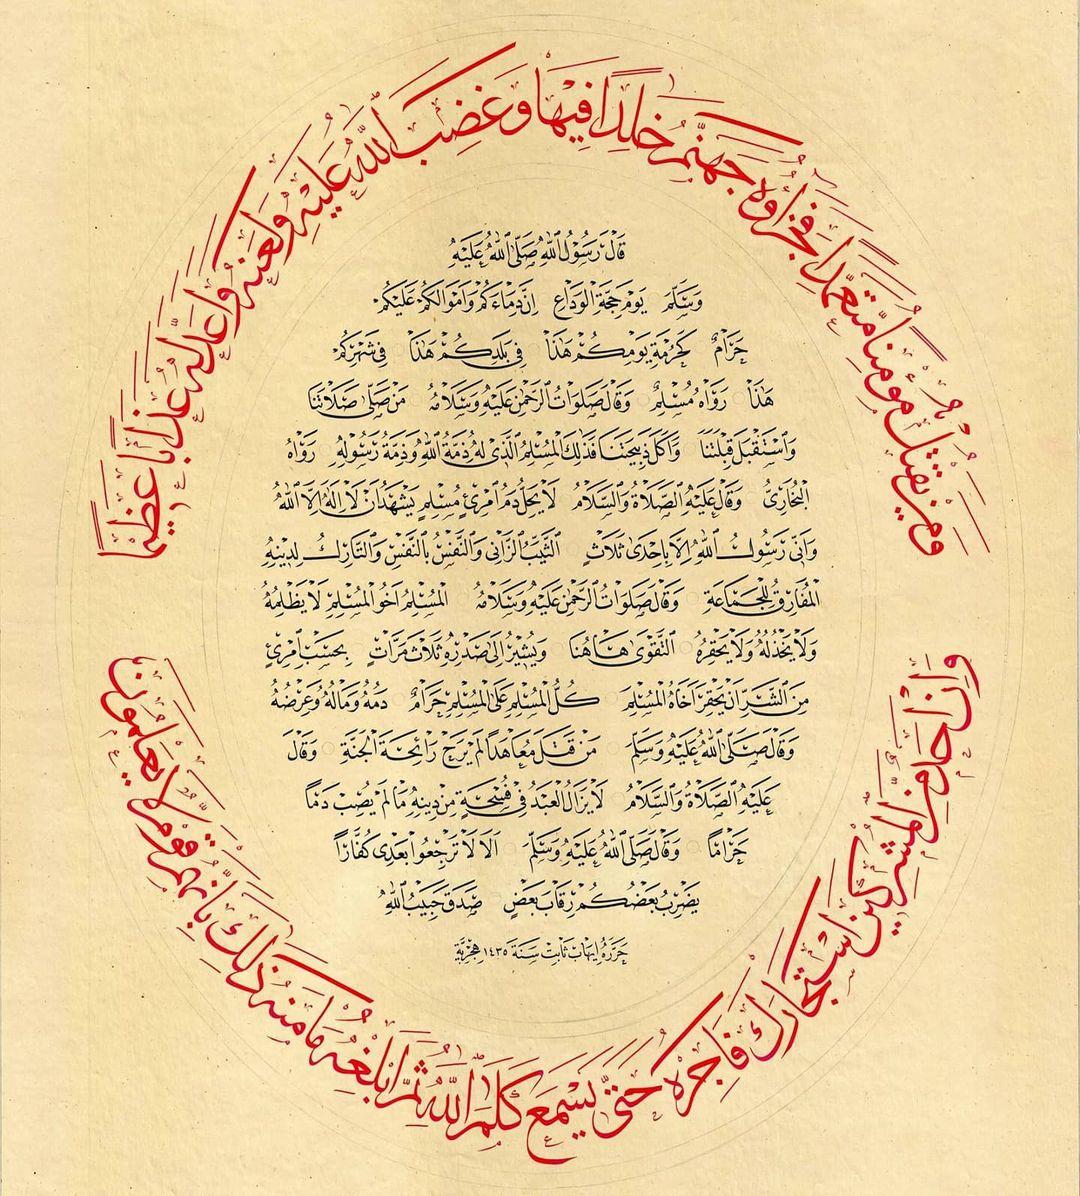 Download karya Kaligrafi Naskhi الخطاط @ehab_thabet لتحميلها بدقة عالية من قناتنا على تلجرام NaskhCalligraphy ، …-naskhcalligraphy